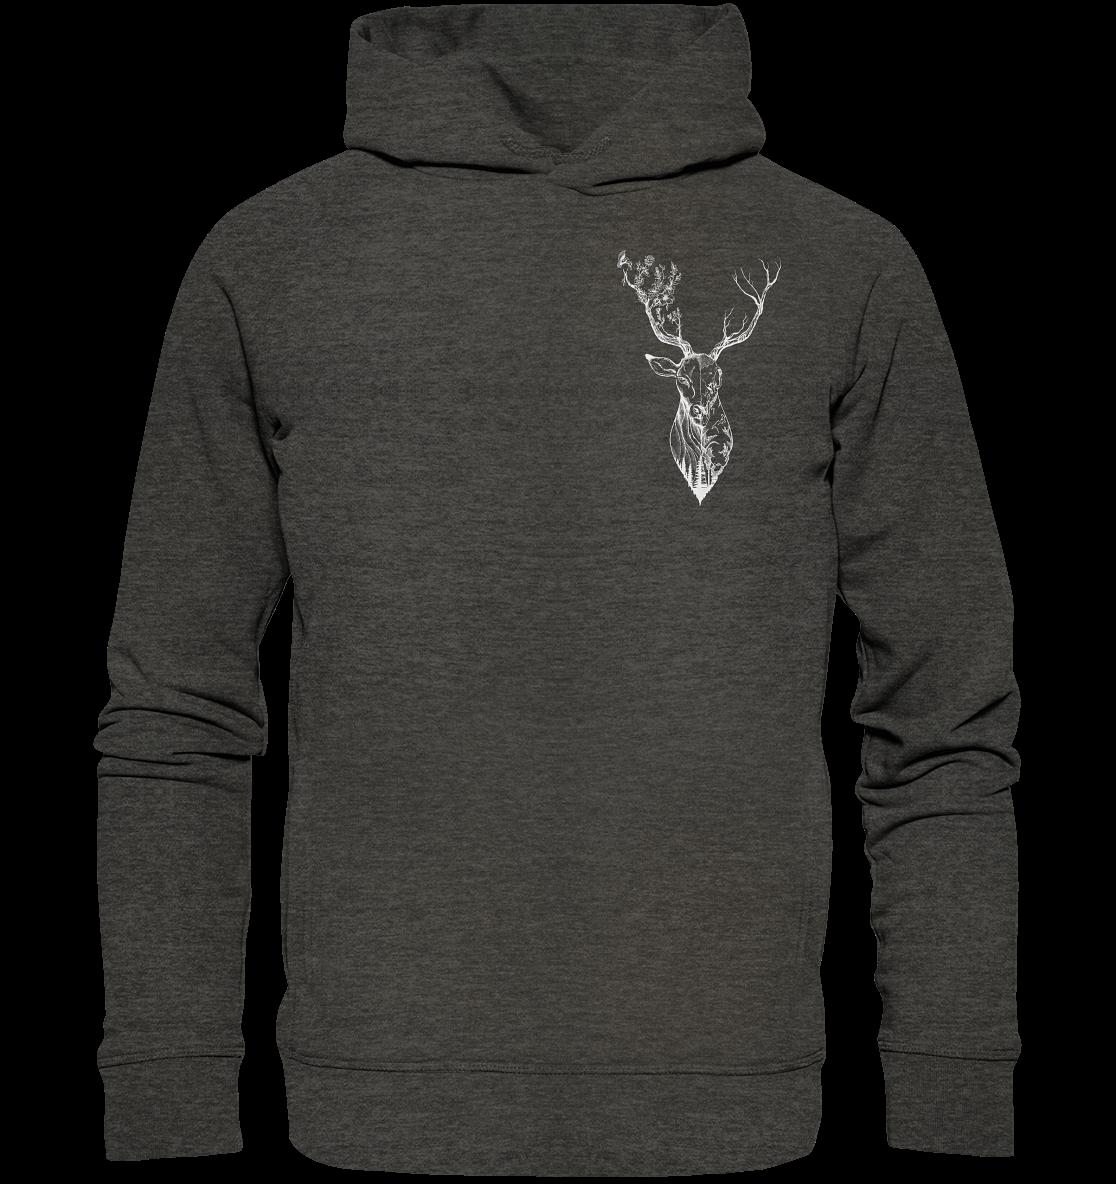 front-organic-fashion-hoodie-252625-1116x-6.png